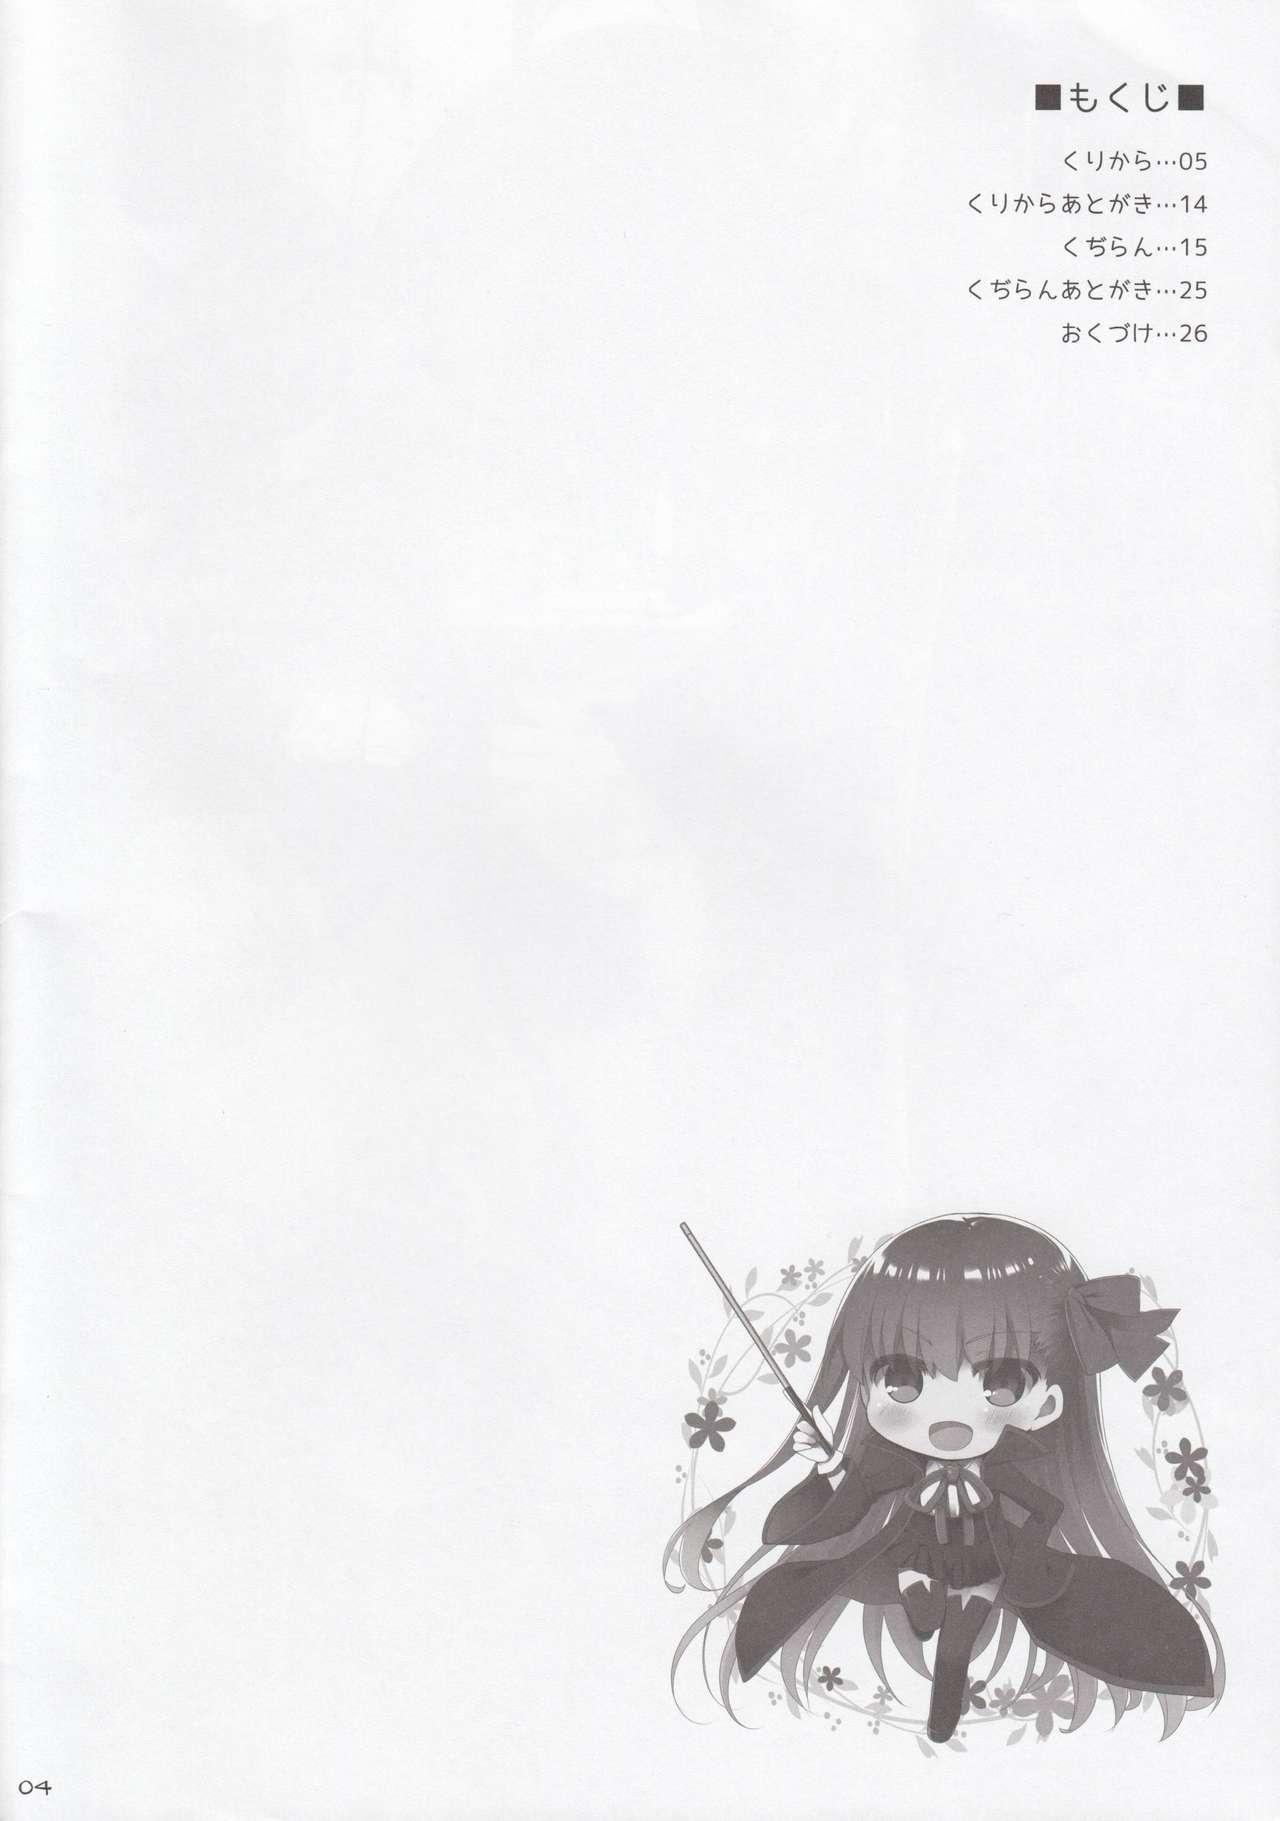 Nyuuri Keizoku Kyousha Kikan CCC 2